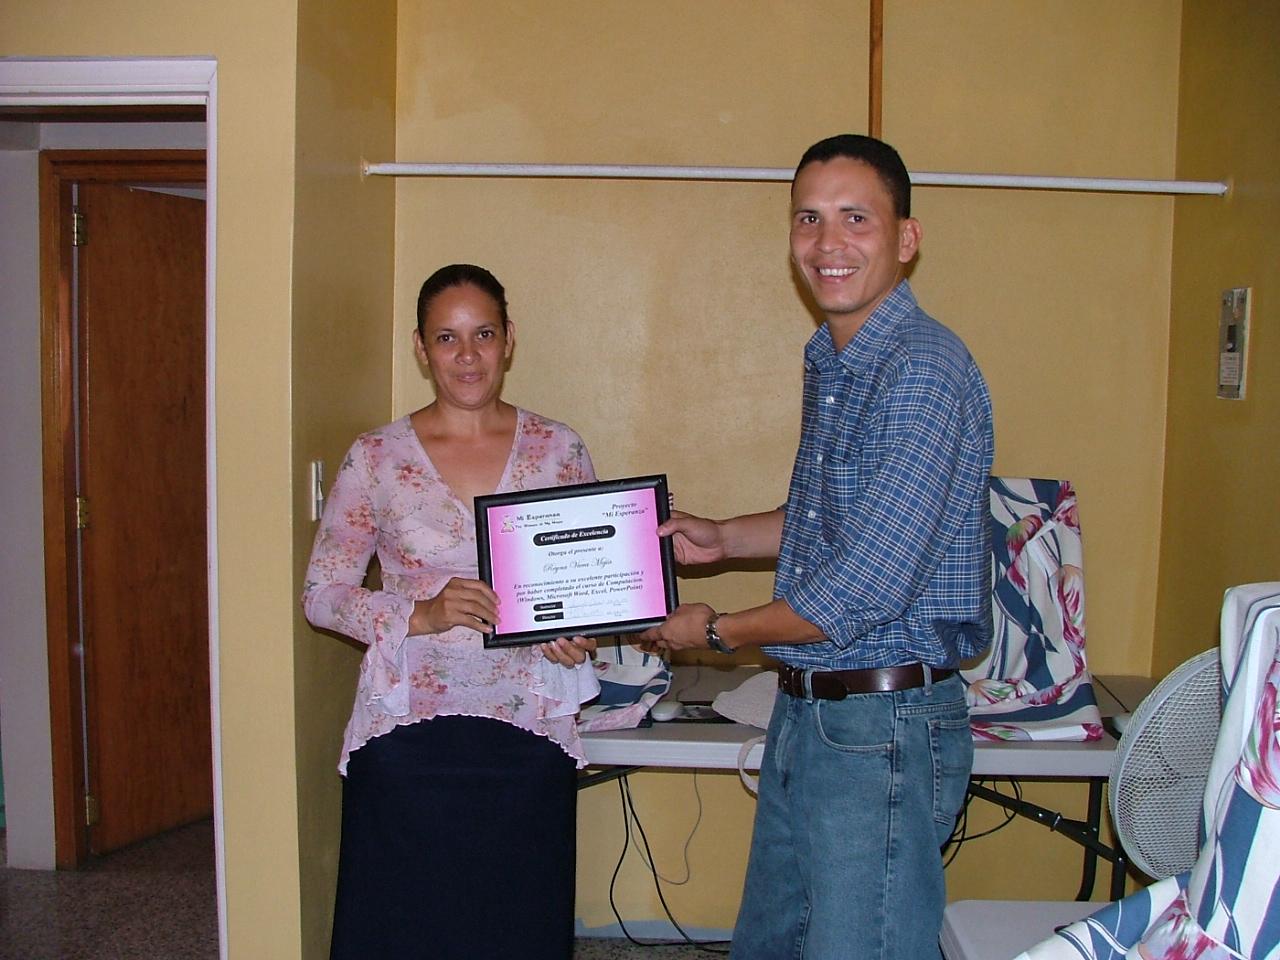 Reyna graduating from the Mi Esperanza computer course 2005